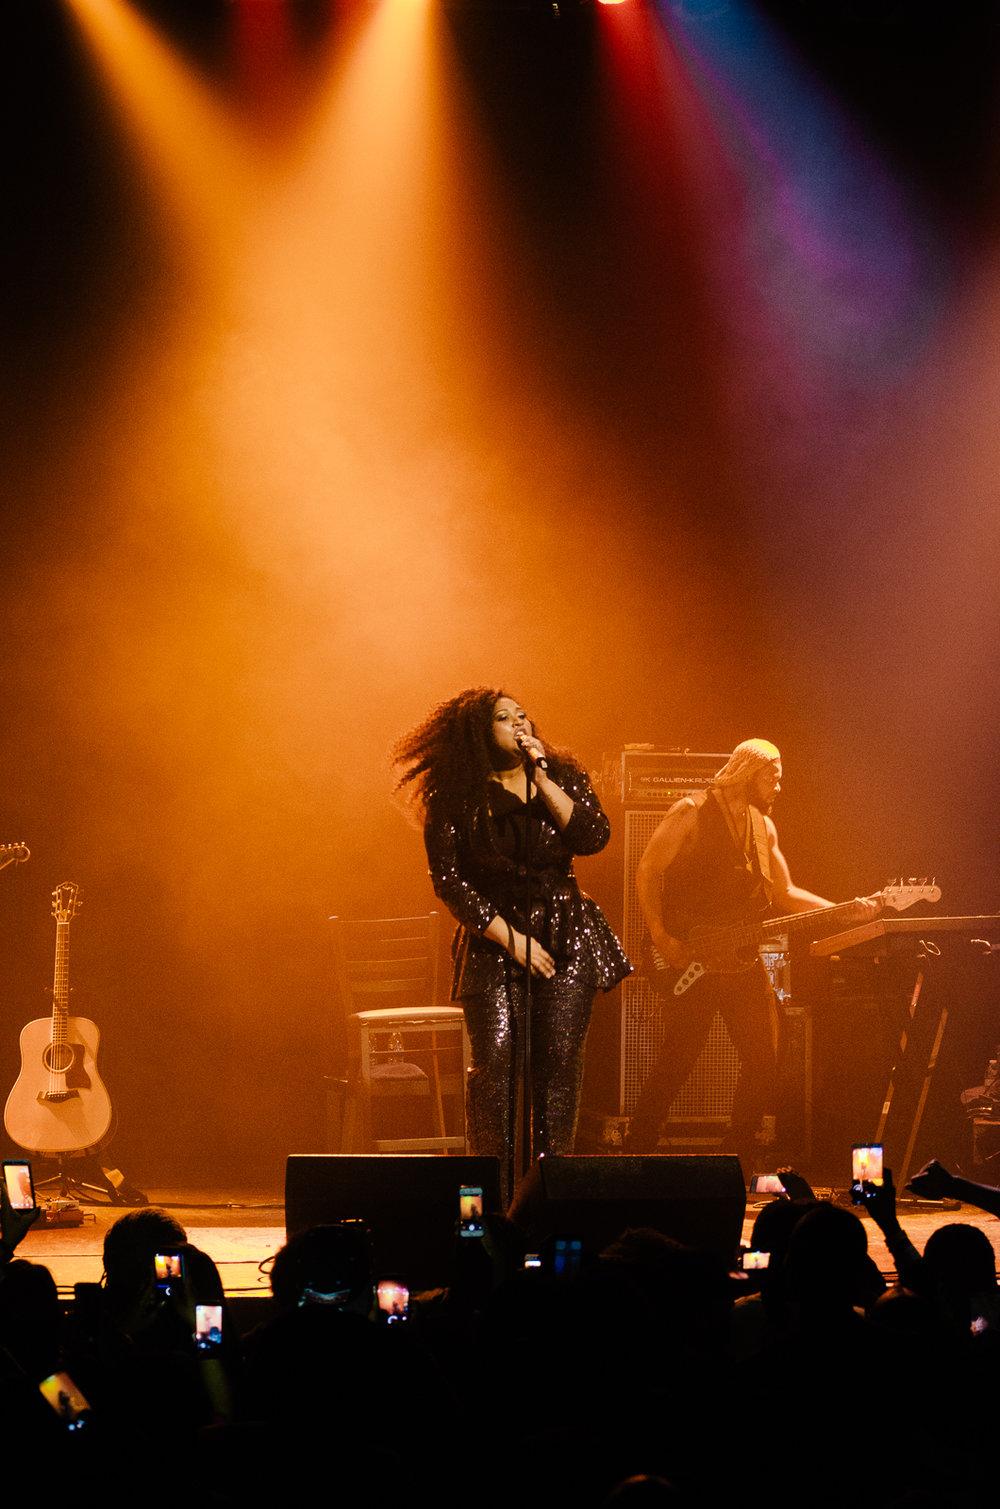 jazmine-sullivan-reality-show-tour-atlanta-509-hires-web.jpg